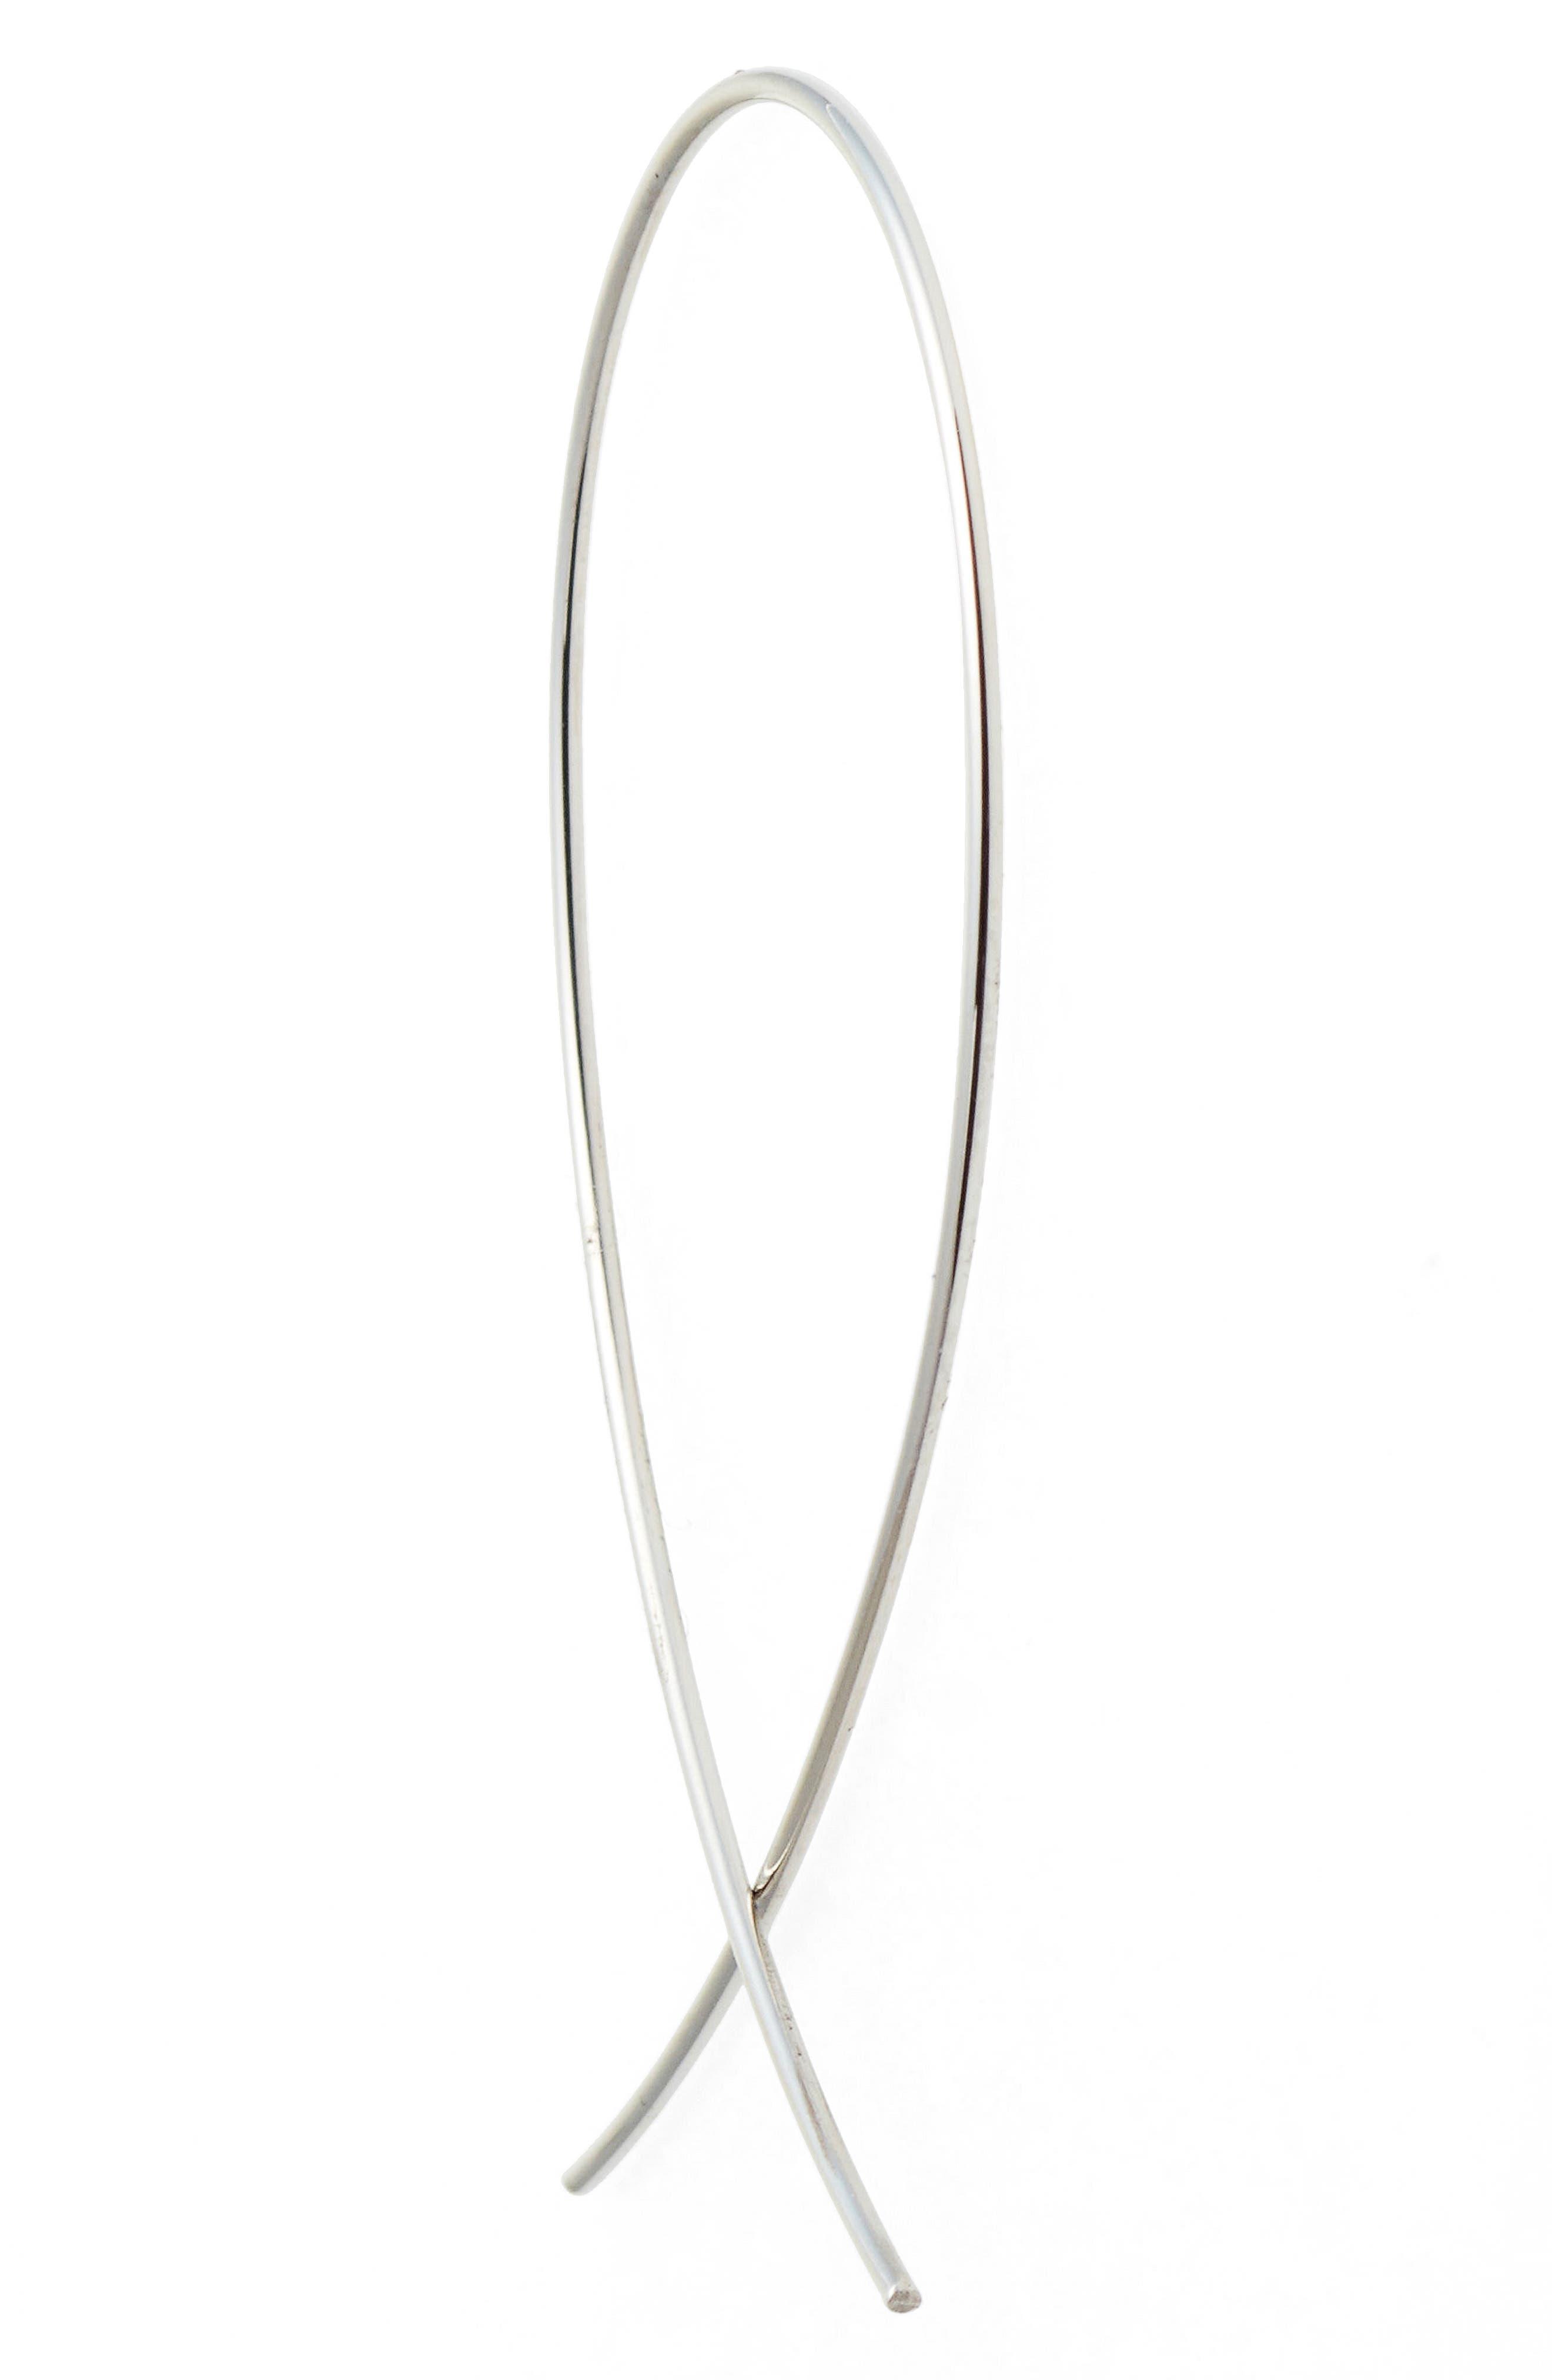 'Upside Down' Small Hoop Earrings,                             Alternate thumbnail 3, color,                             WHITE GOLD